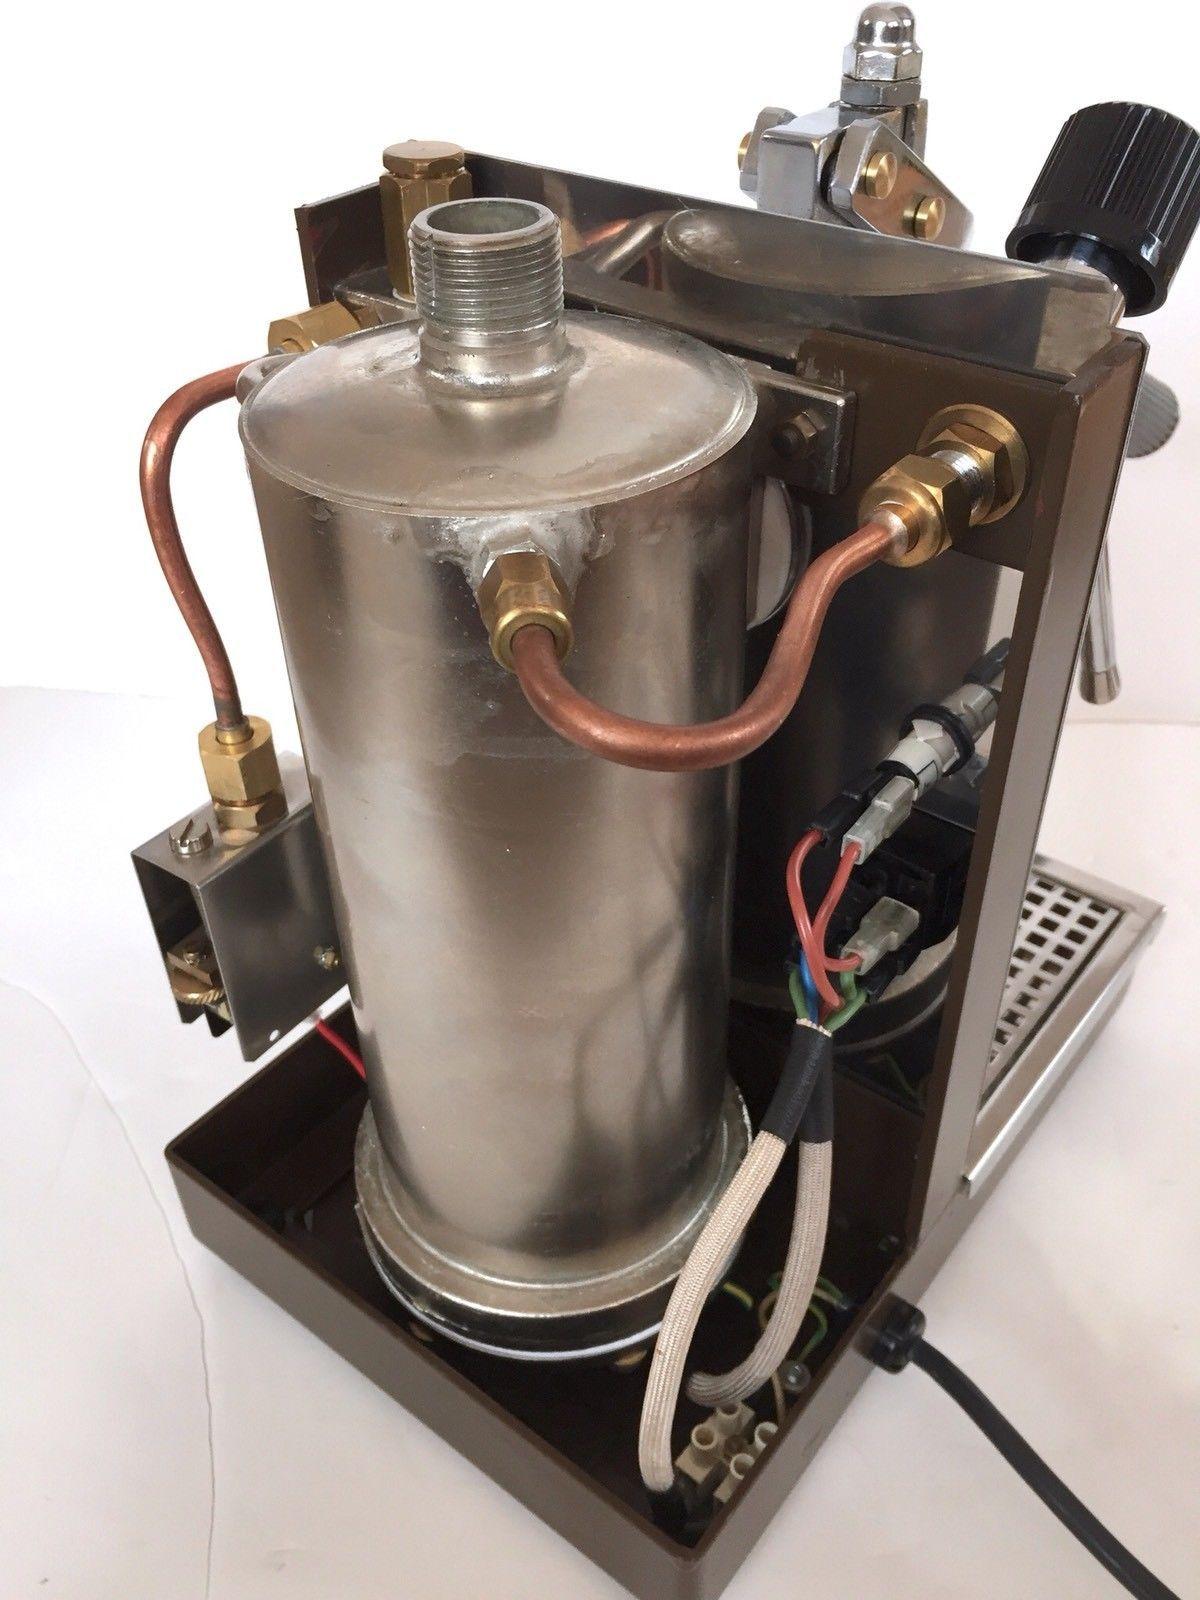 Olympia Express Cremina Vintage Lever Espresso Machine Clean Rebuilt Upgrades Espresso Machines Espresso Coffee Machine Espresso